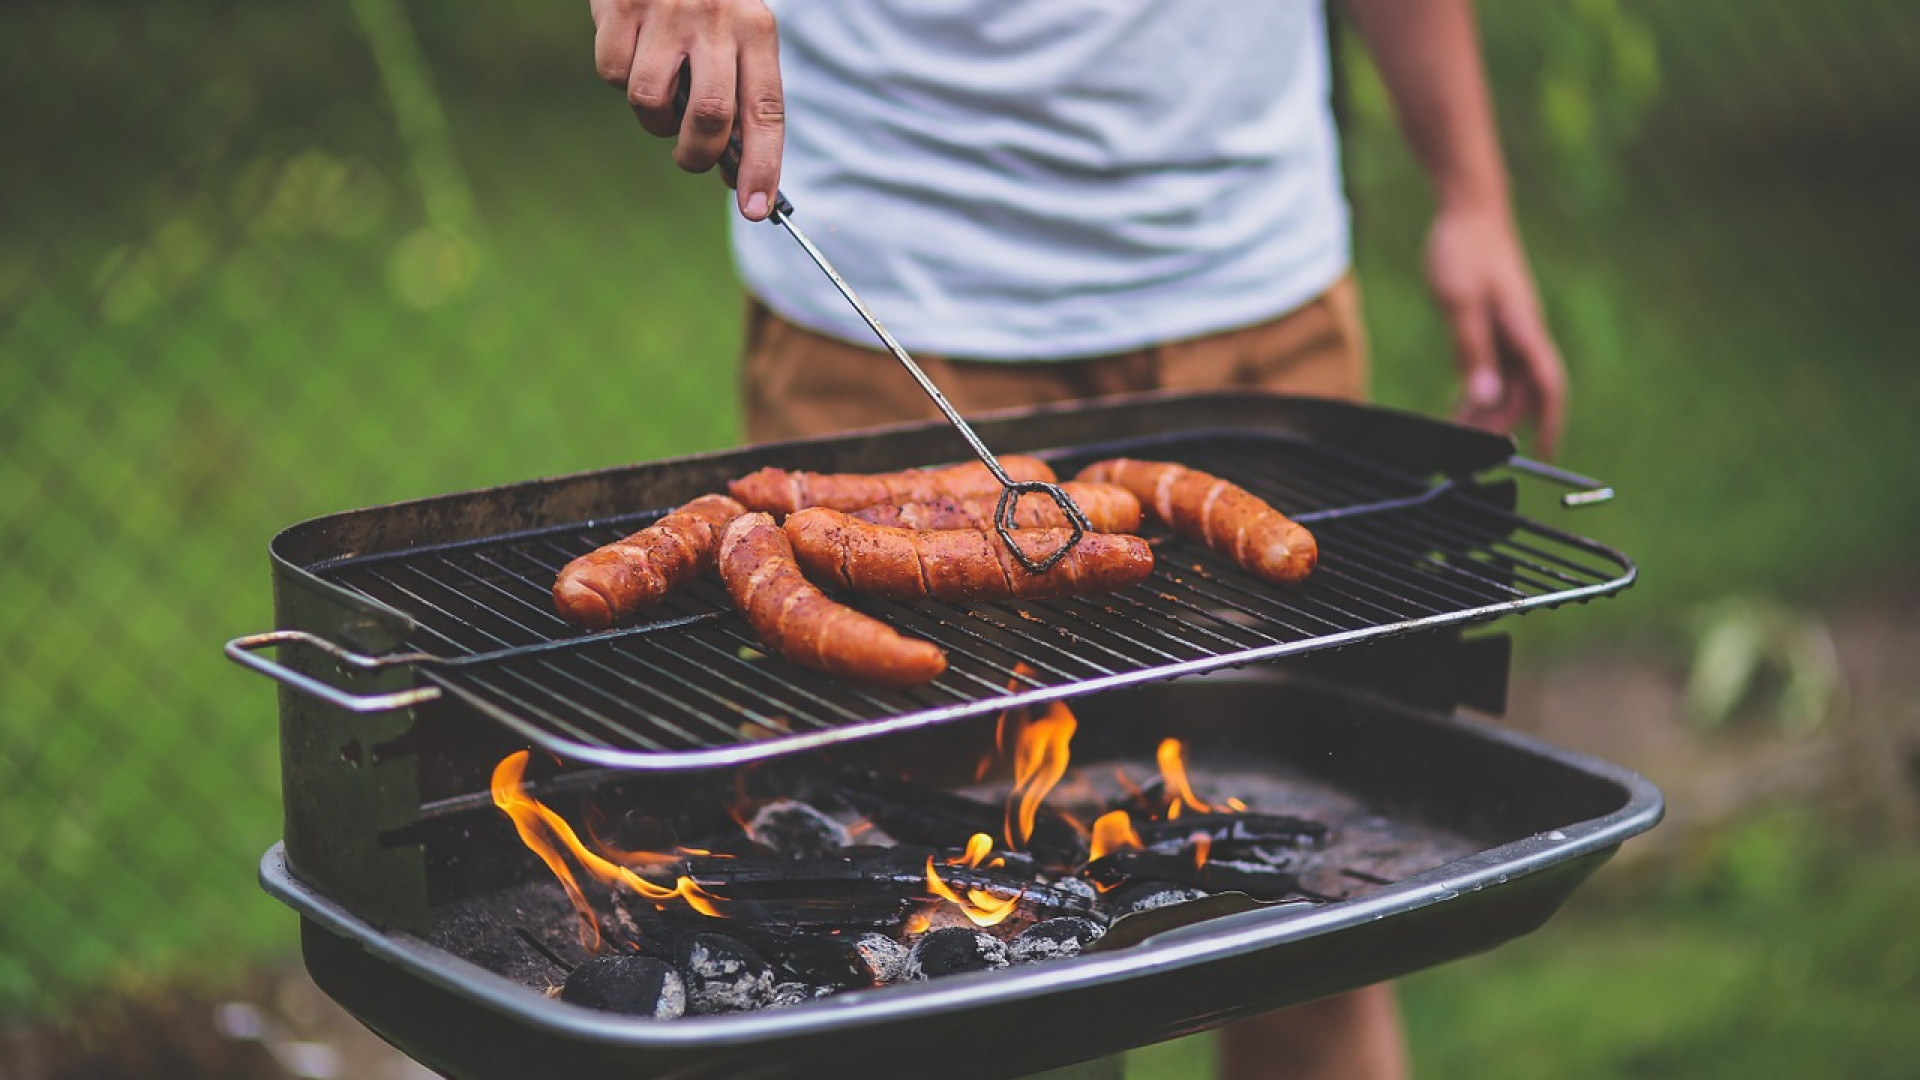 Comment nettoyer votre barbecue ?